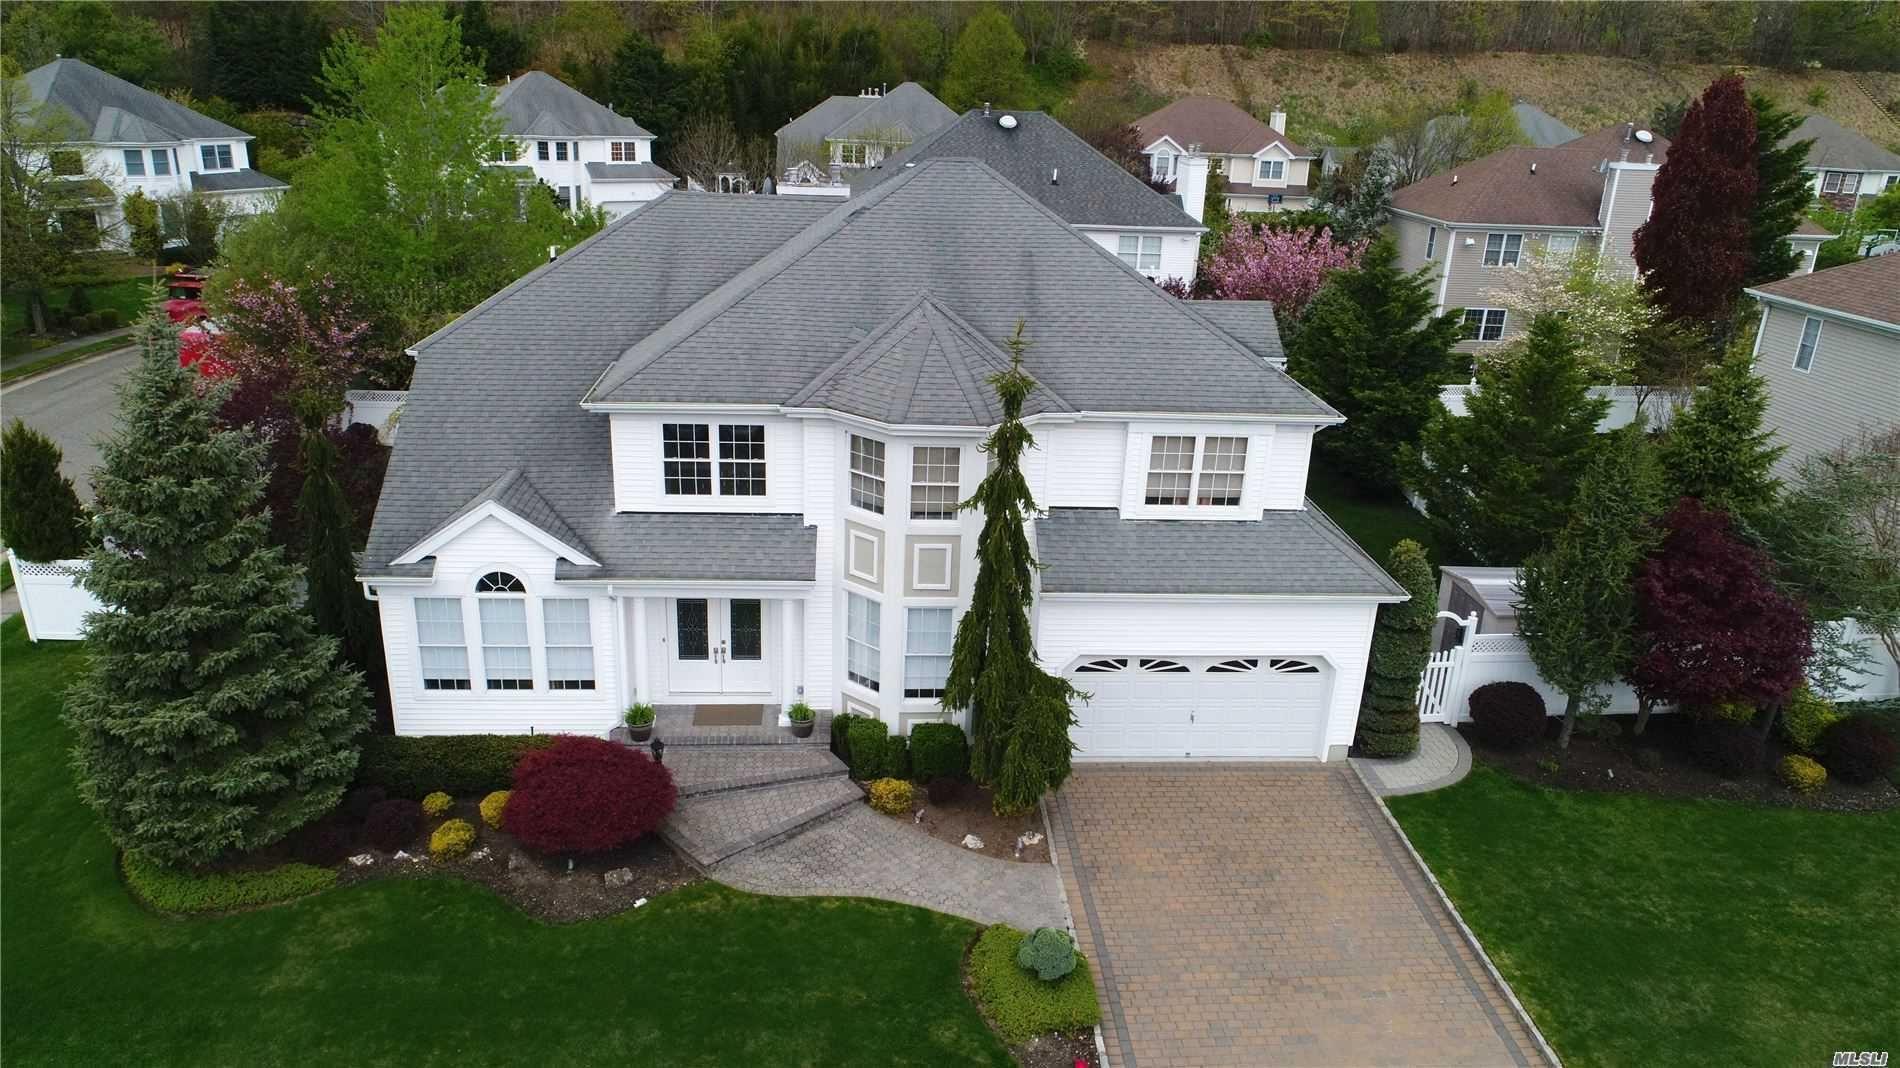 11 Boxwood Lane, Farmingdale, NY 11735 - MLS#: 3213847